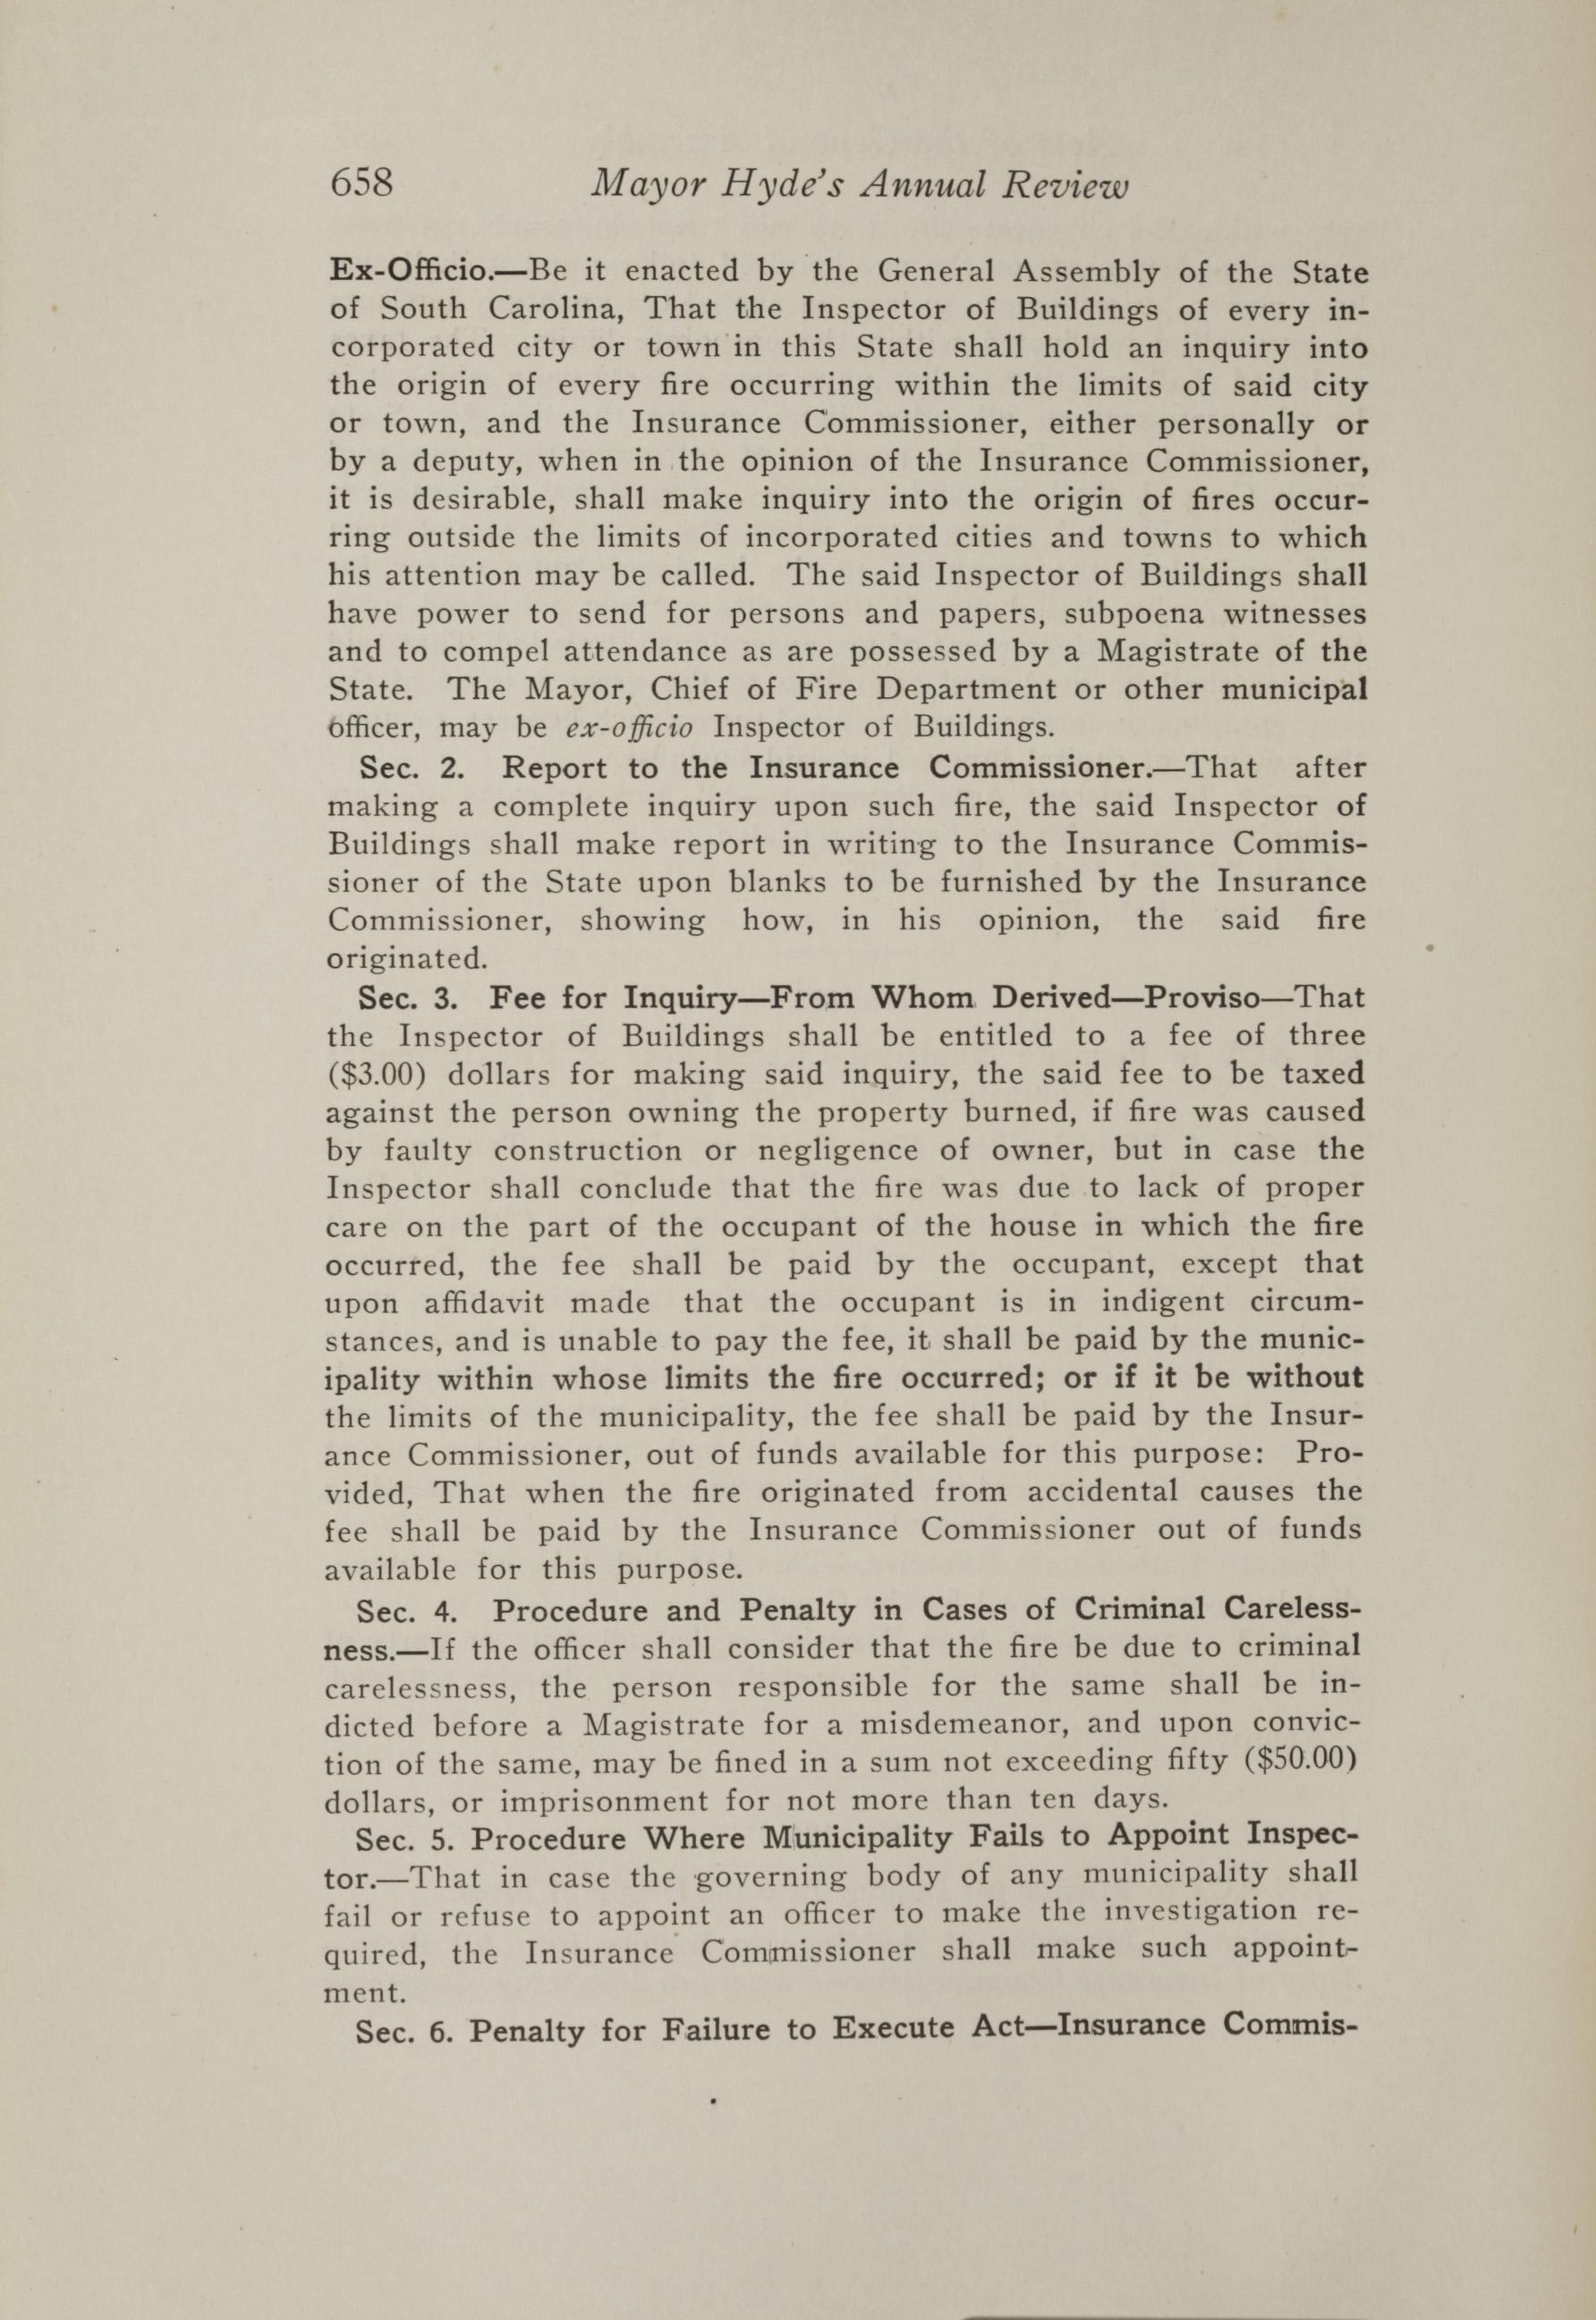 Charleston Yearbook, 1917, page 658